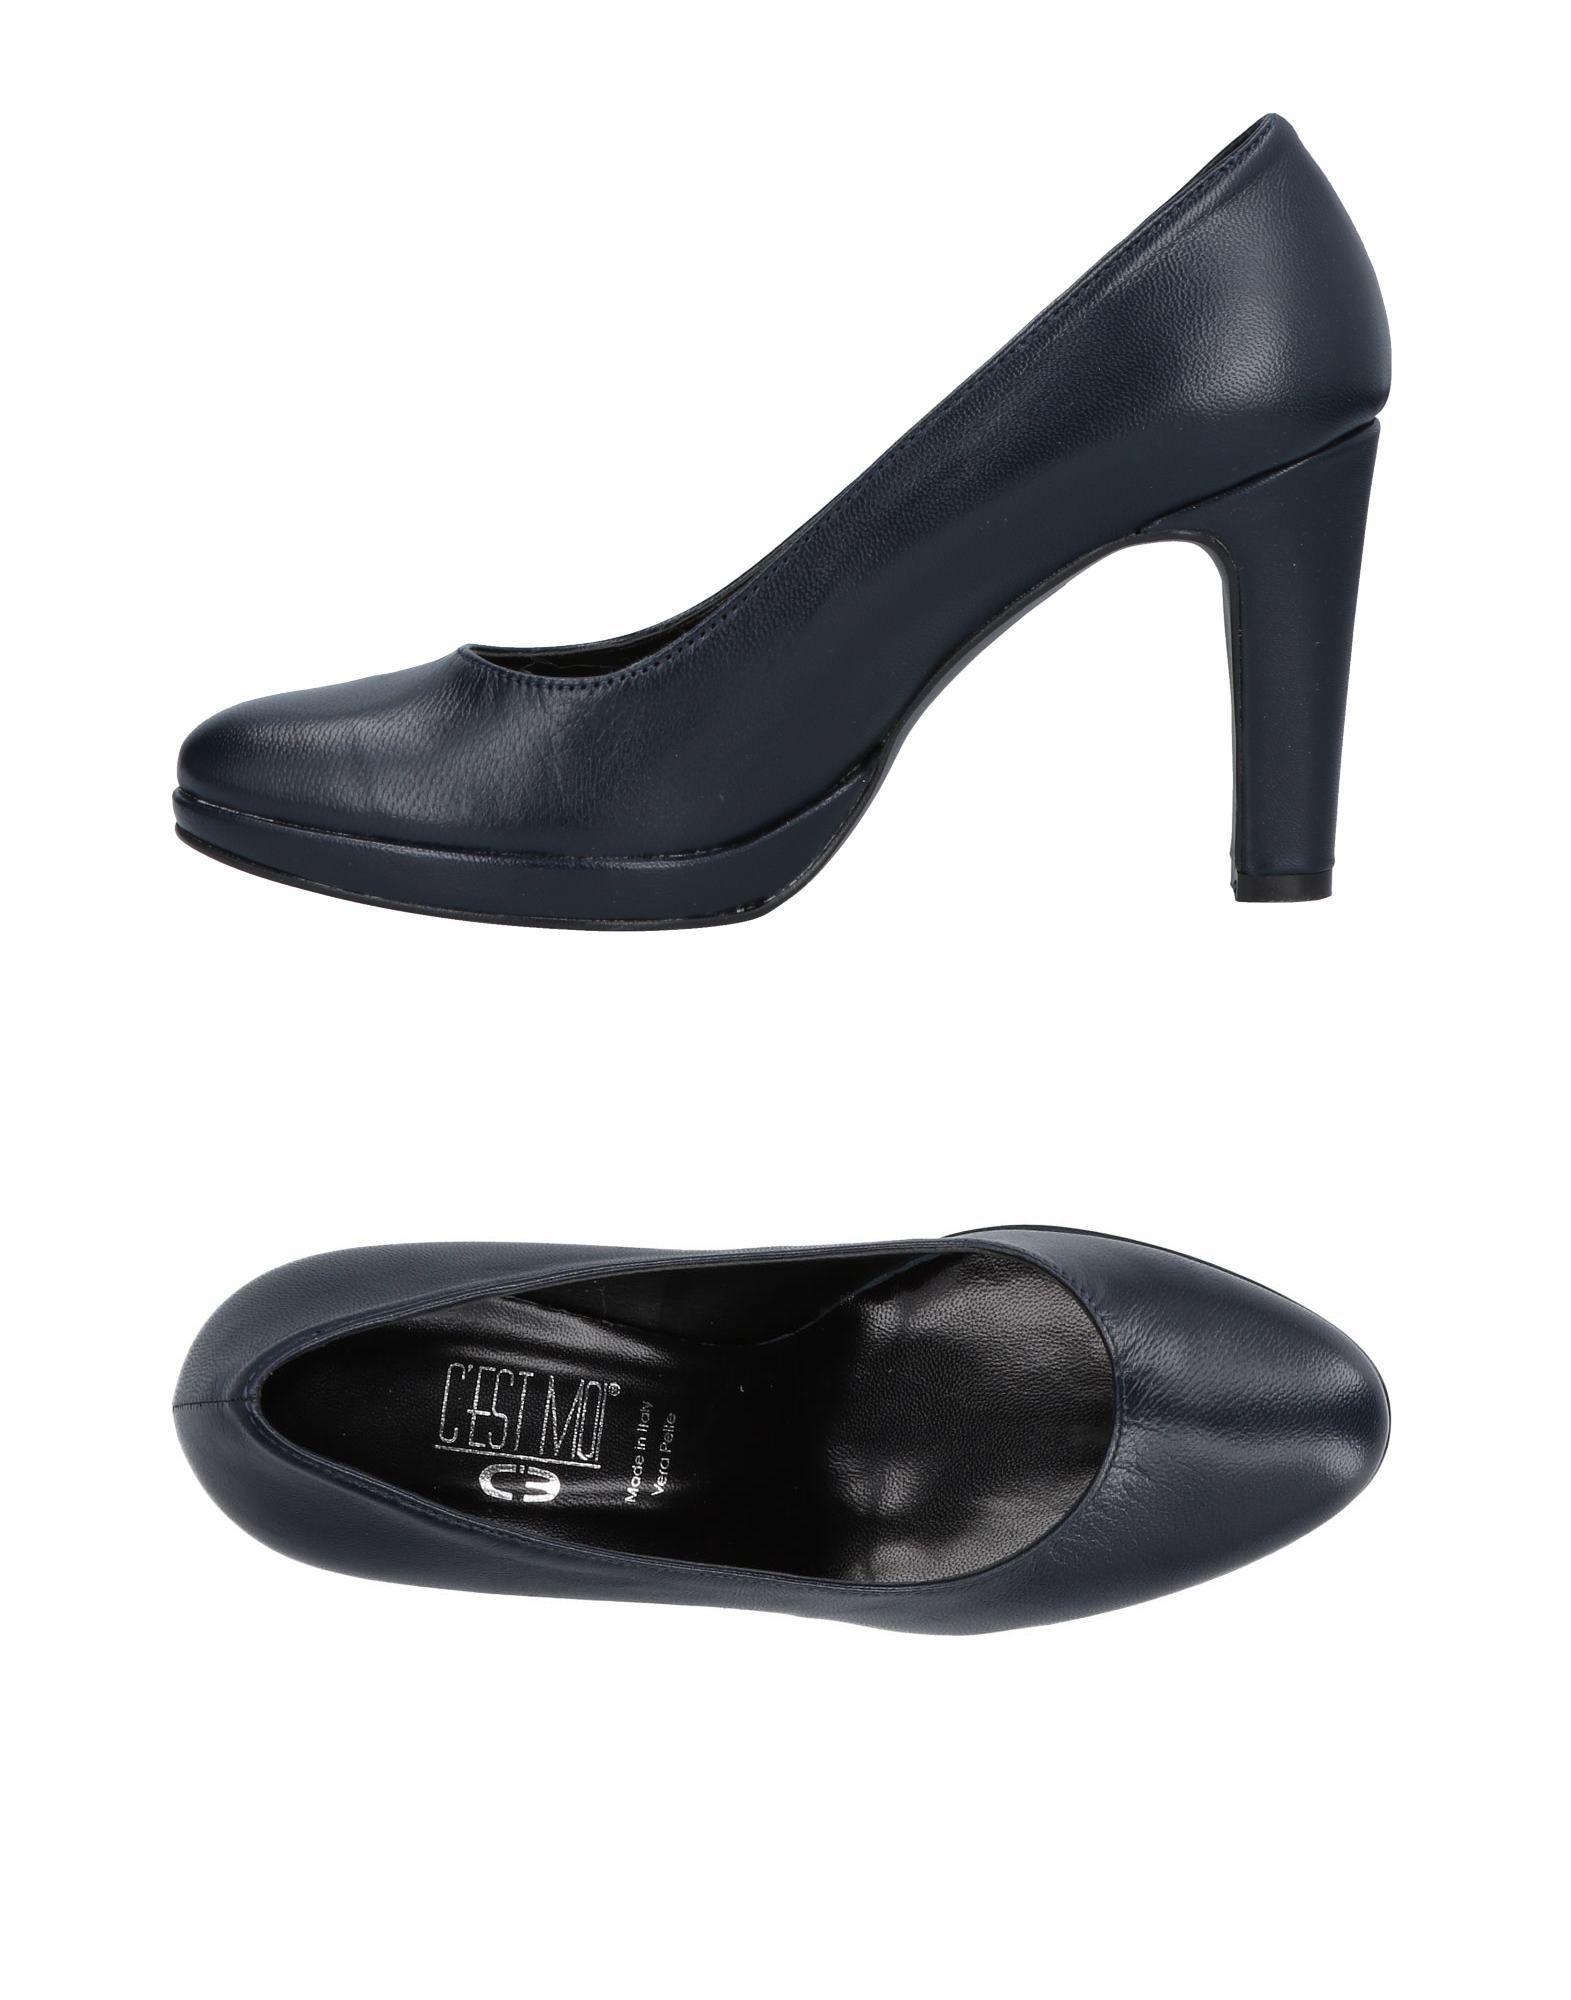 C'EST MOI Туфли одежда для балета wear moi div03 wearmoi